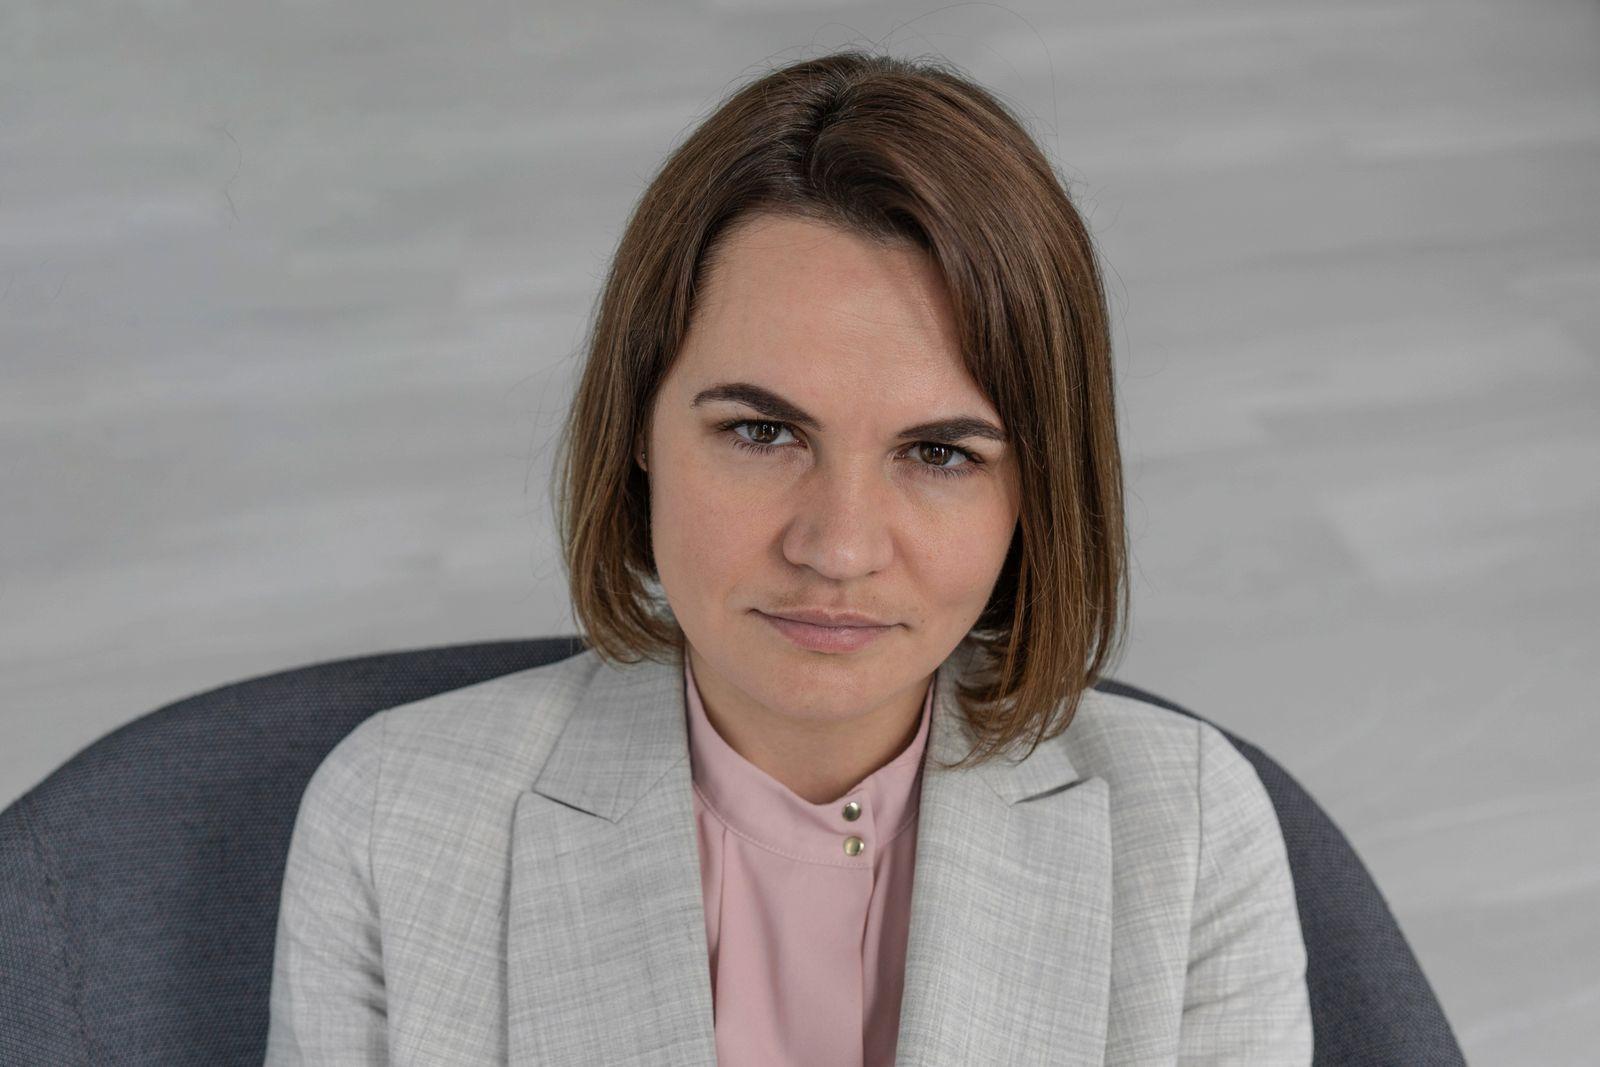 Sviatlana Tsikhanouskaya for Der Spiegel, photographed by Severina Venckutė, 2021, Vilnius.